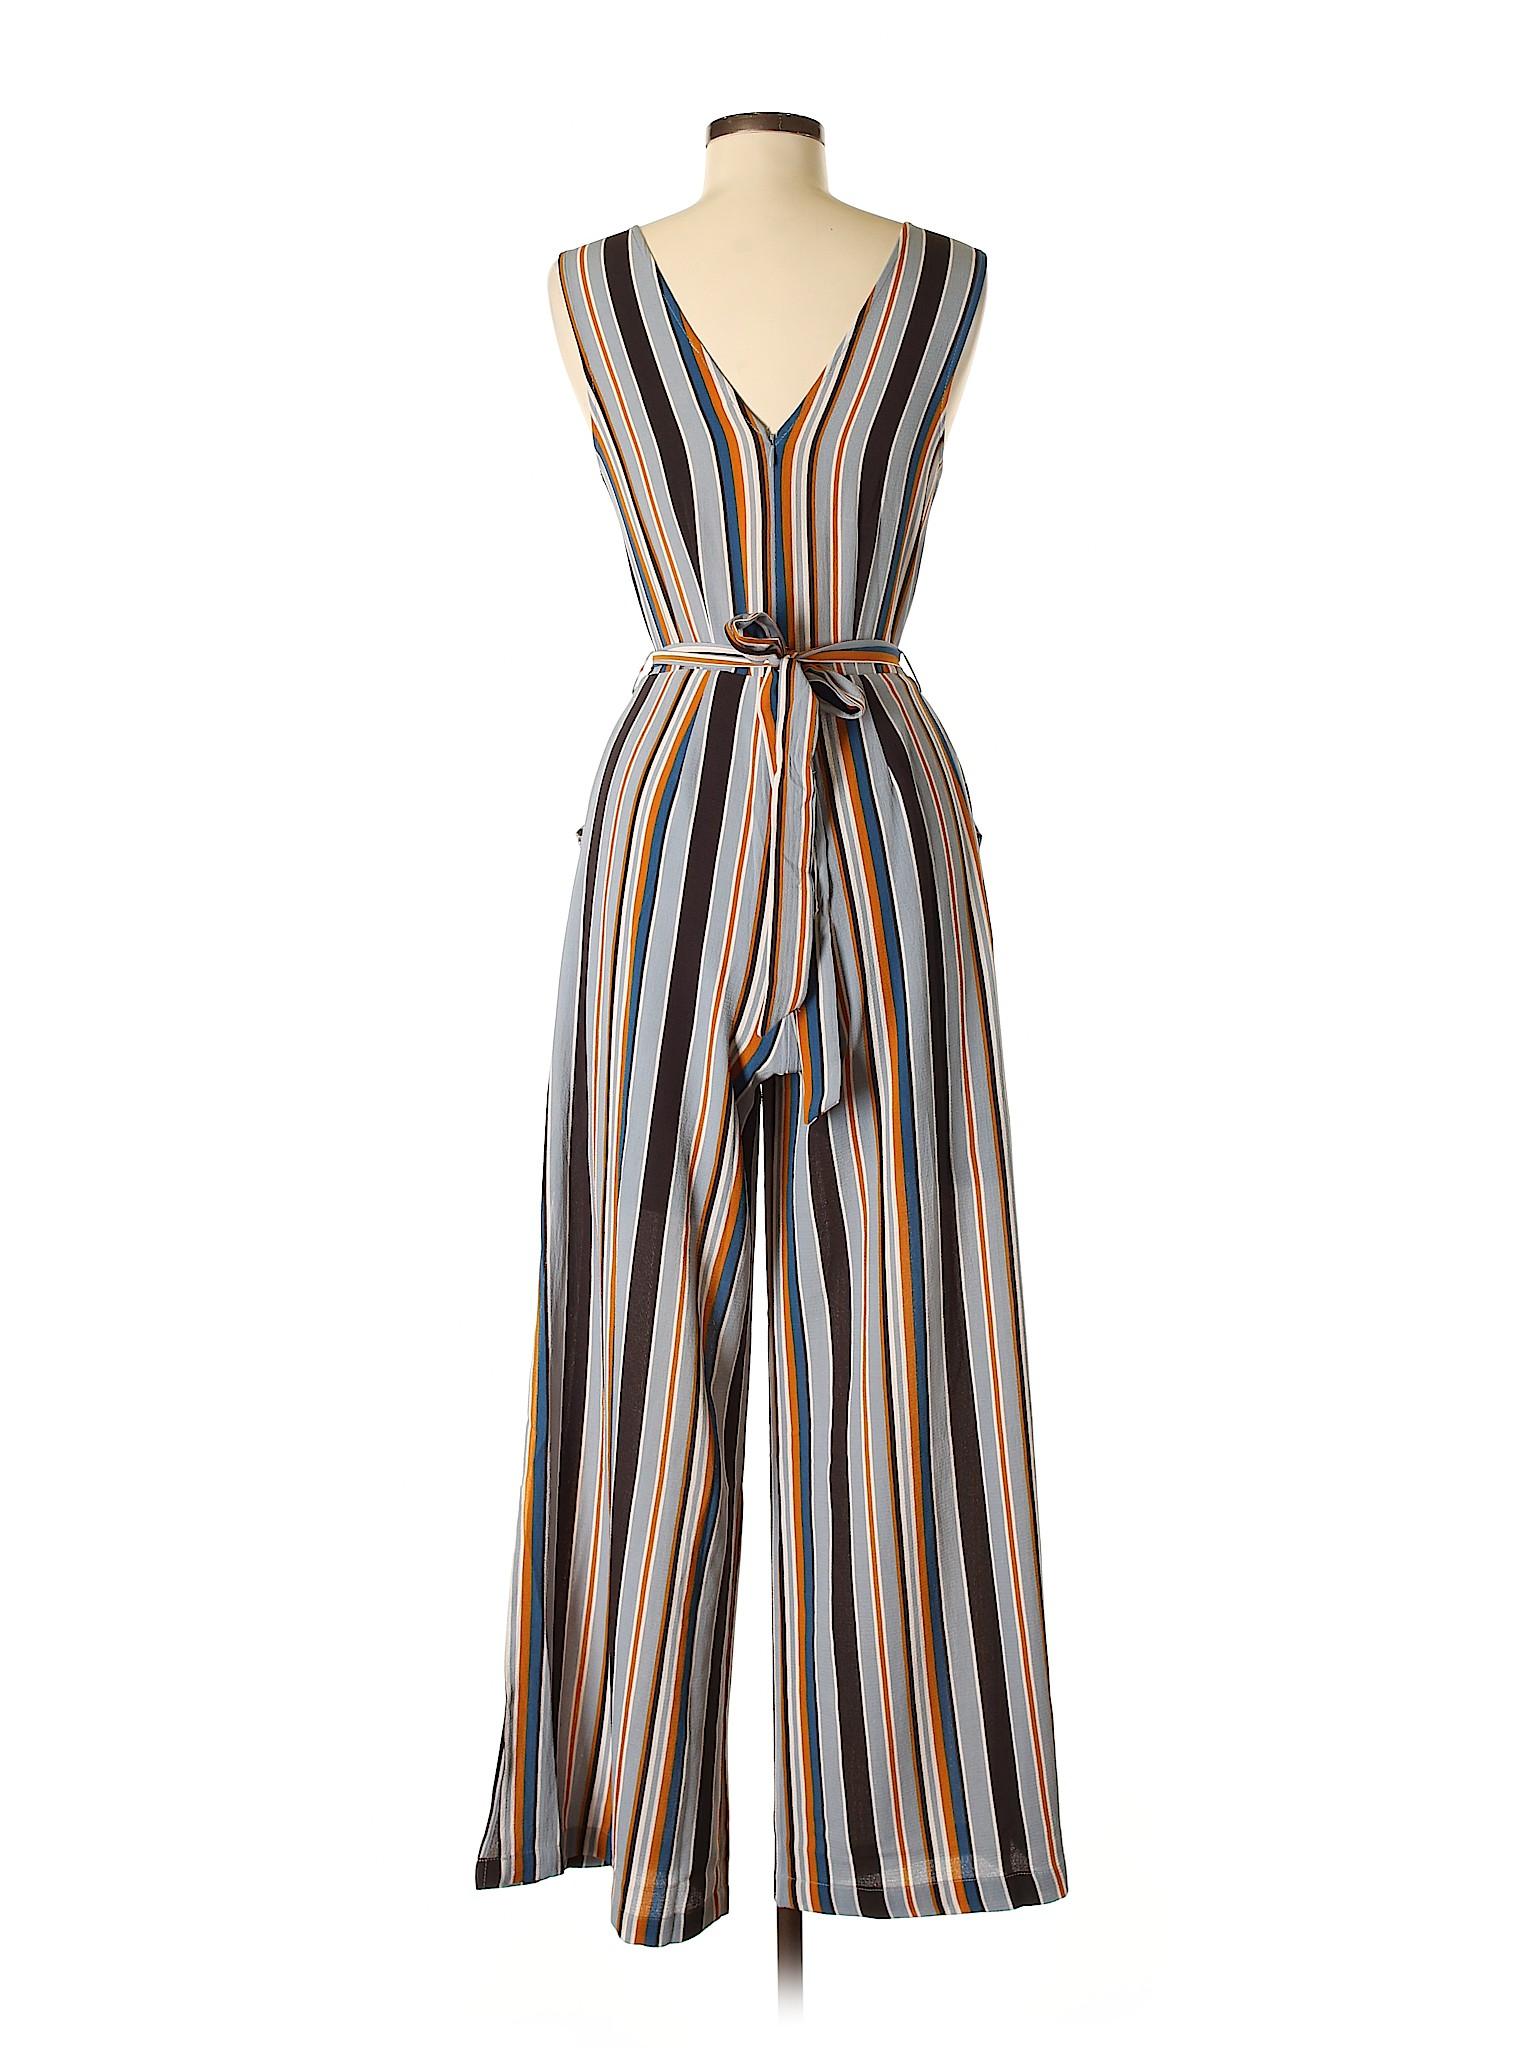 a42ca1ee394 Monteau 100% Polyester Stripes Light Blue Jumpsuit Size M - 40% off ...